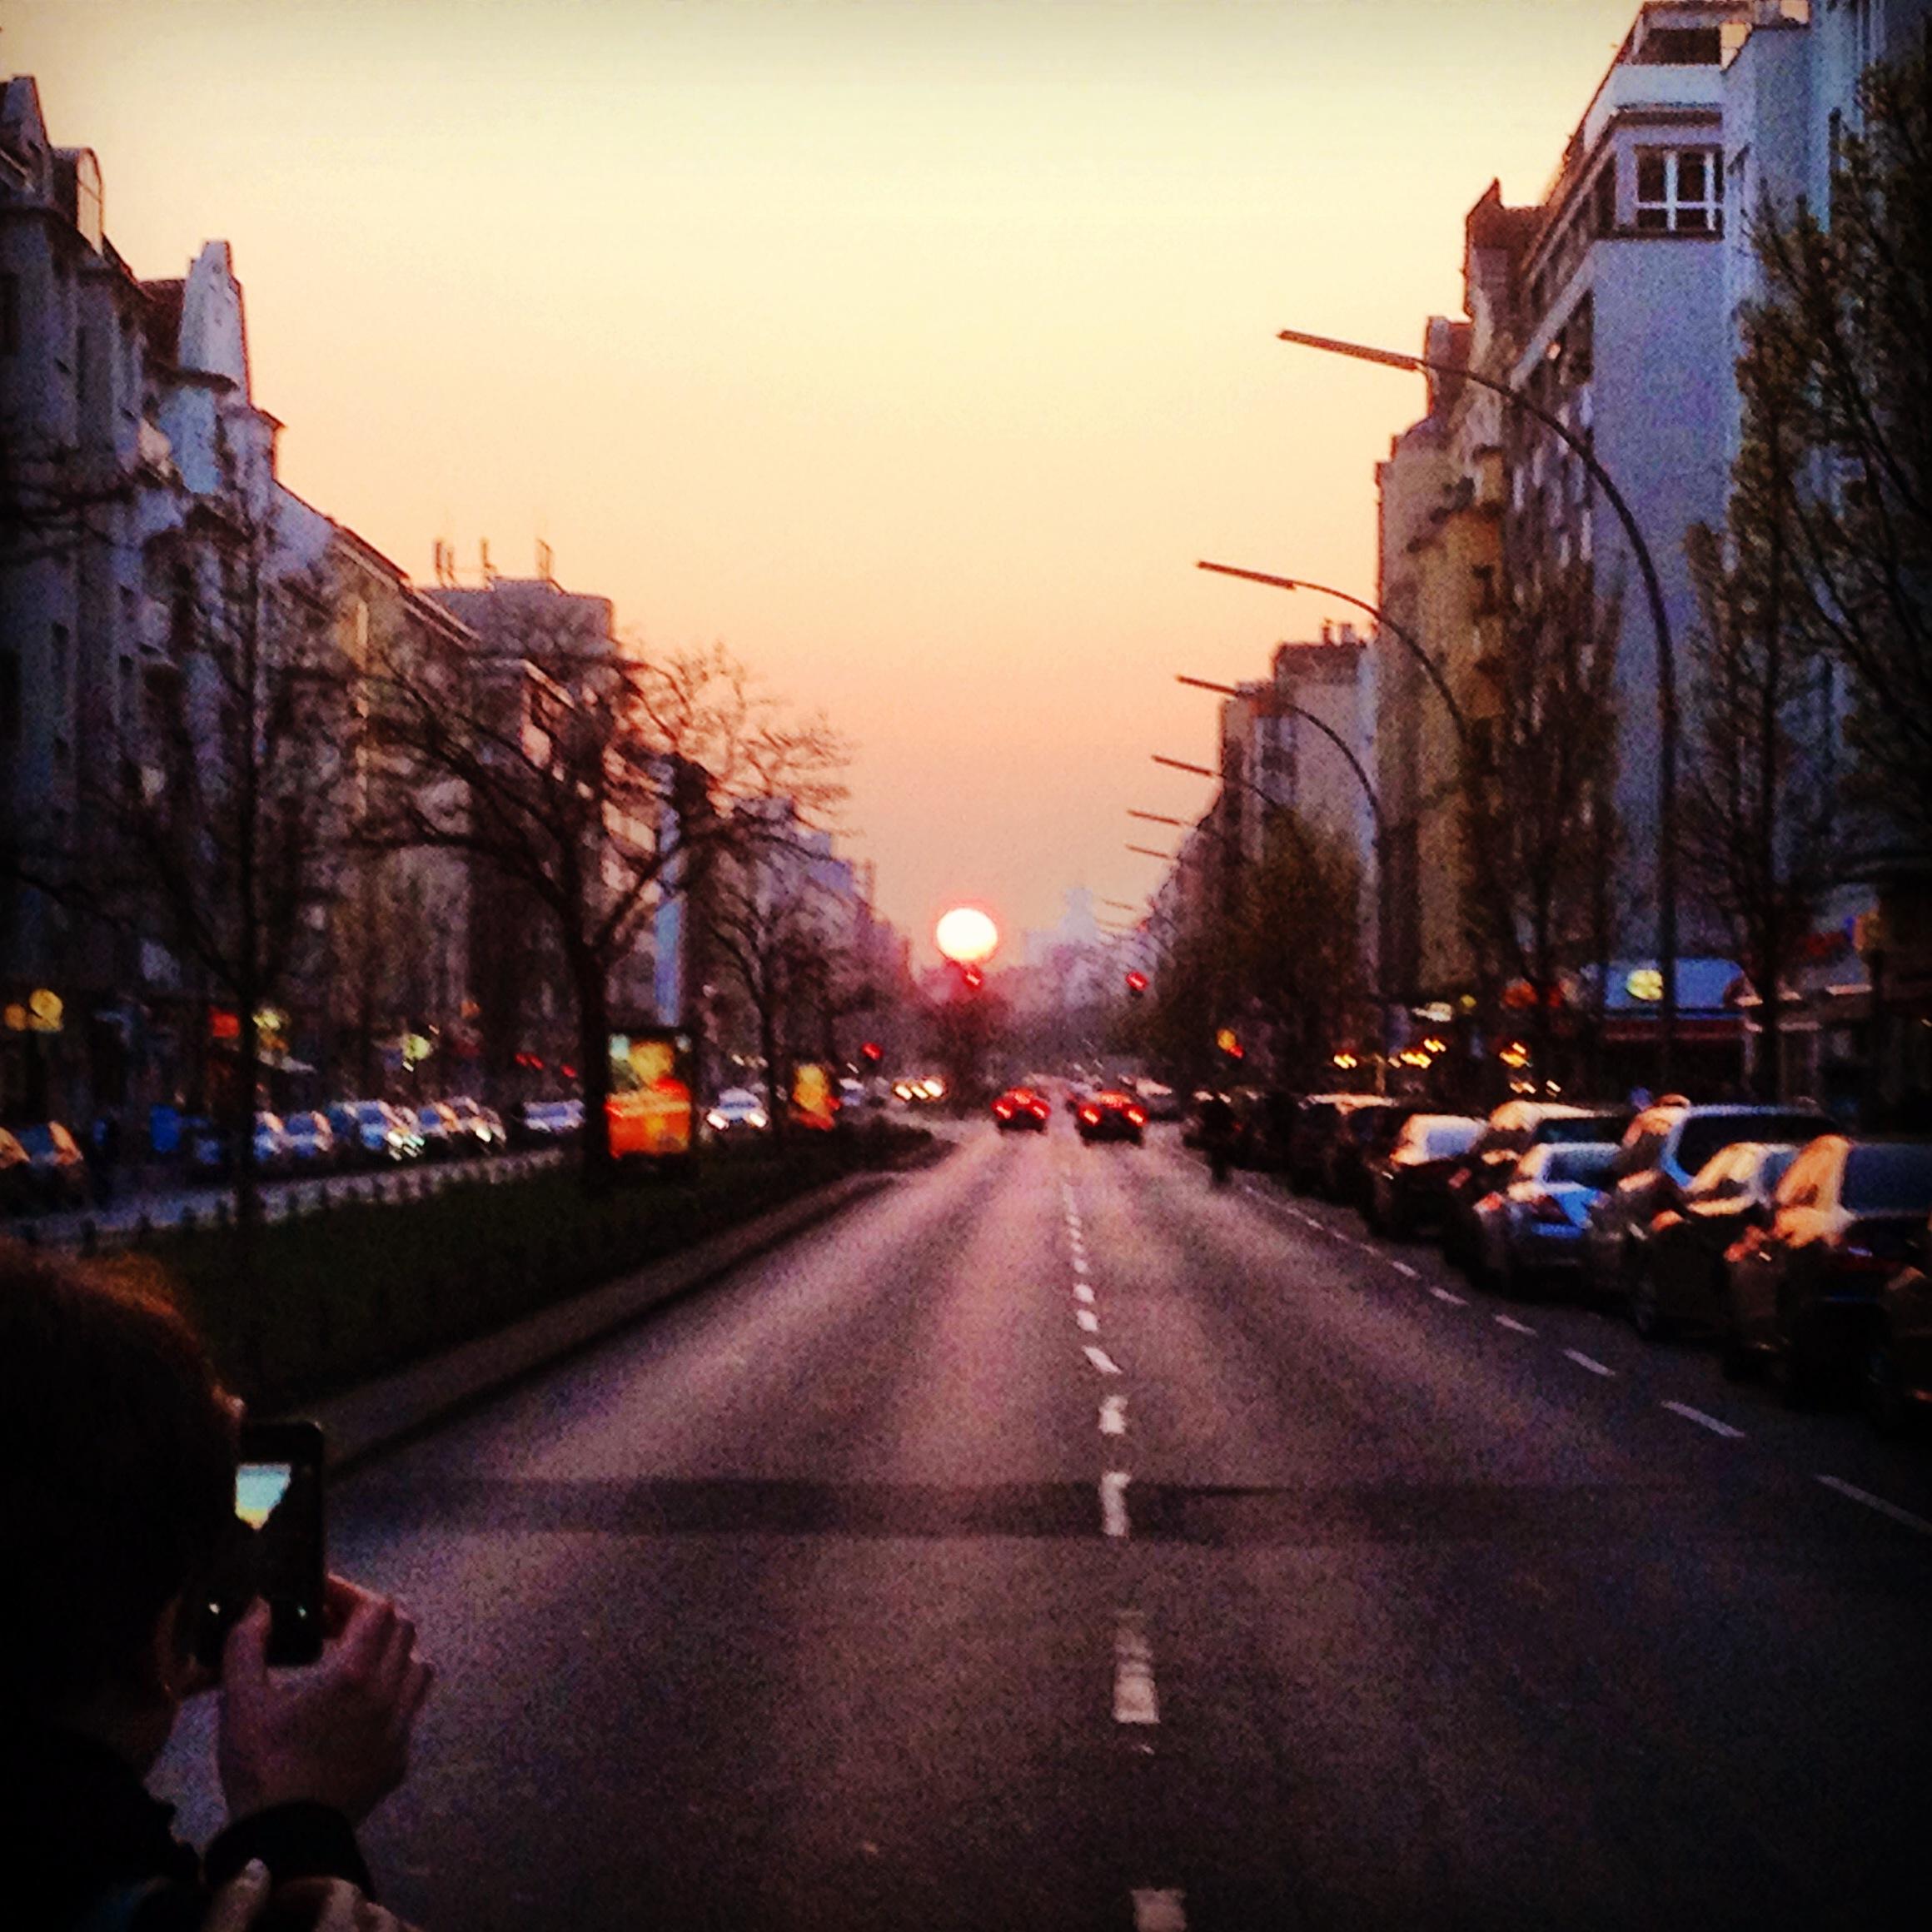 berlinspiriert-fotografie-smartphoto-design (1)